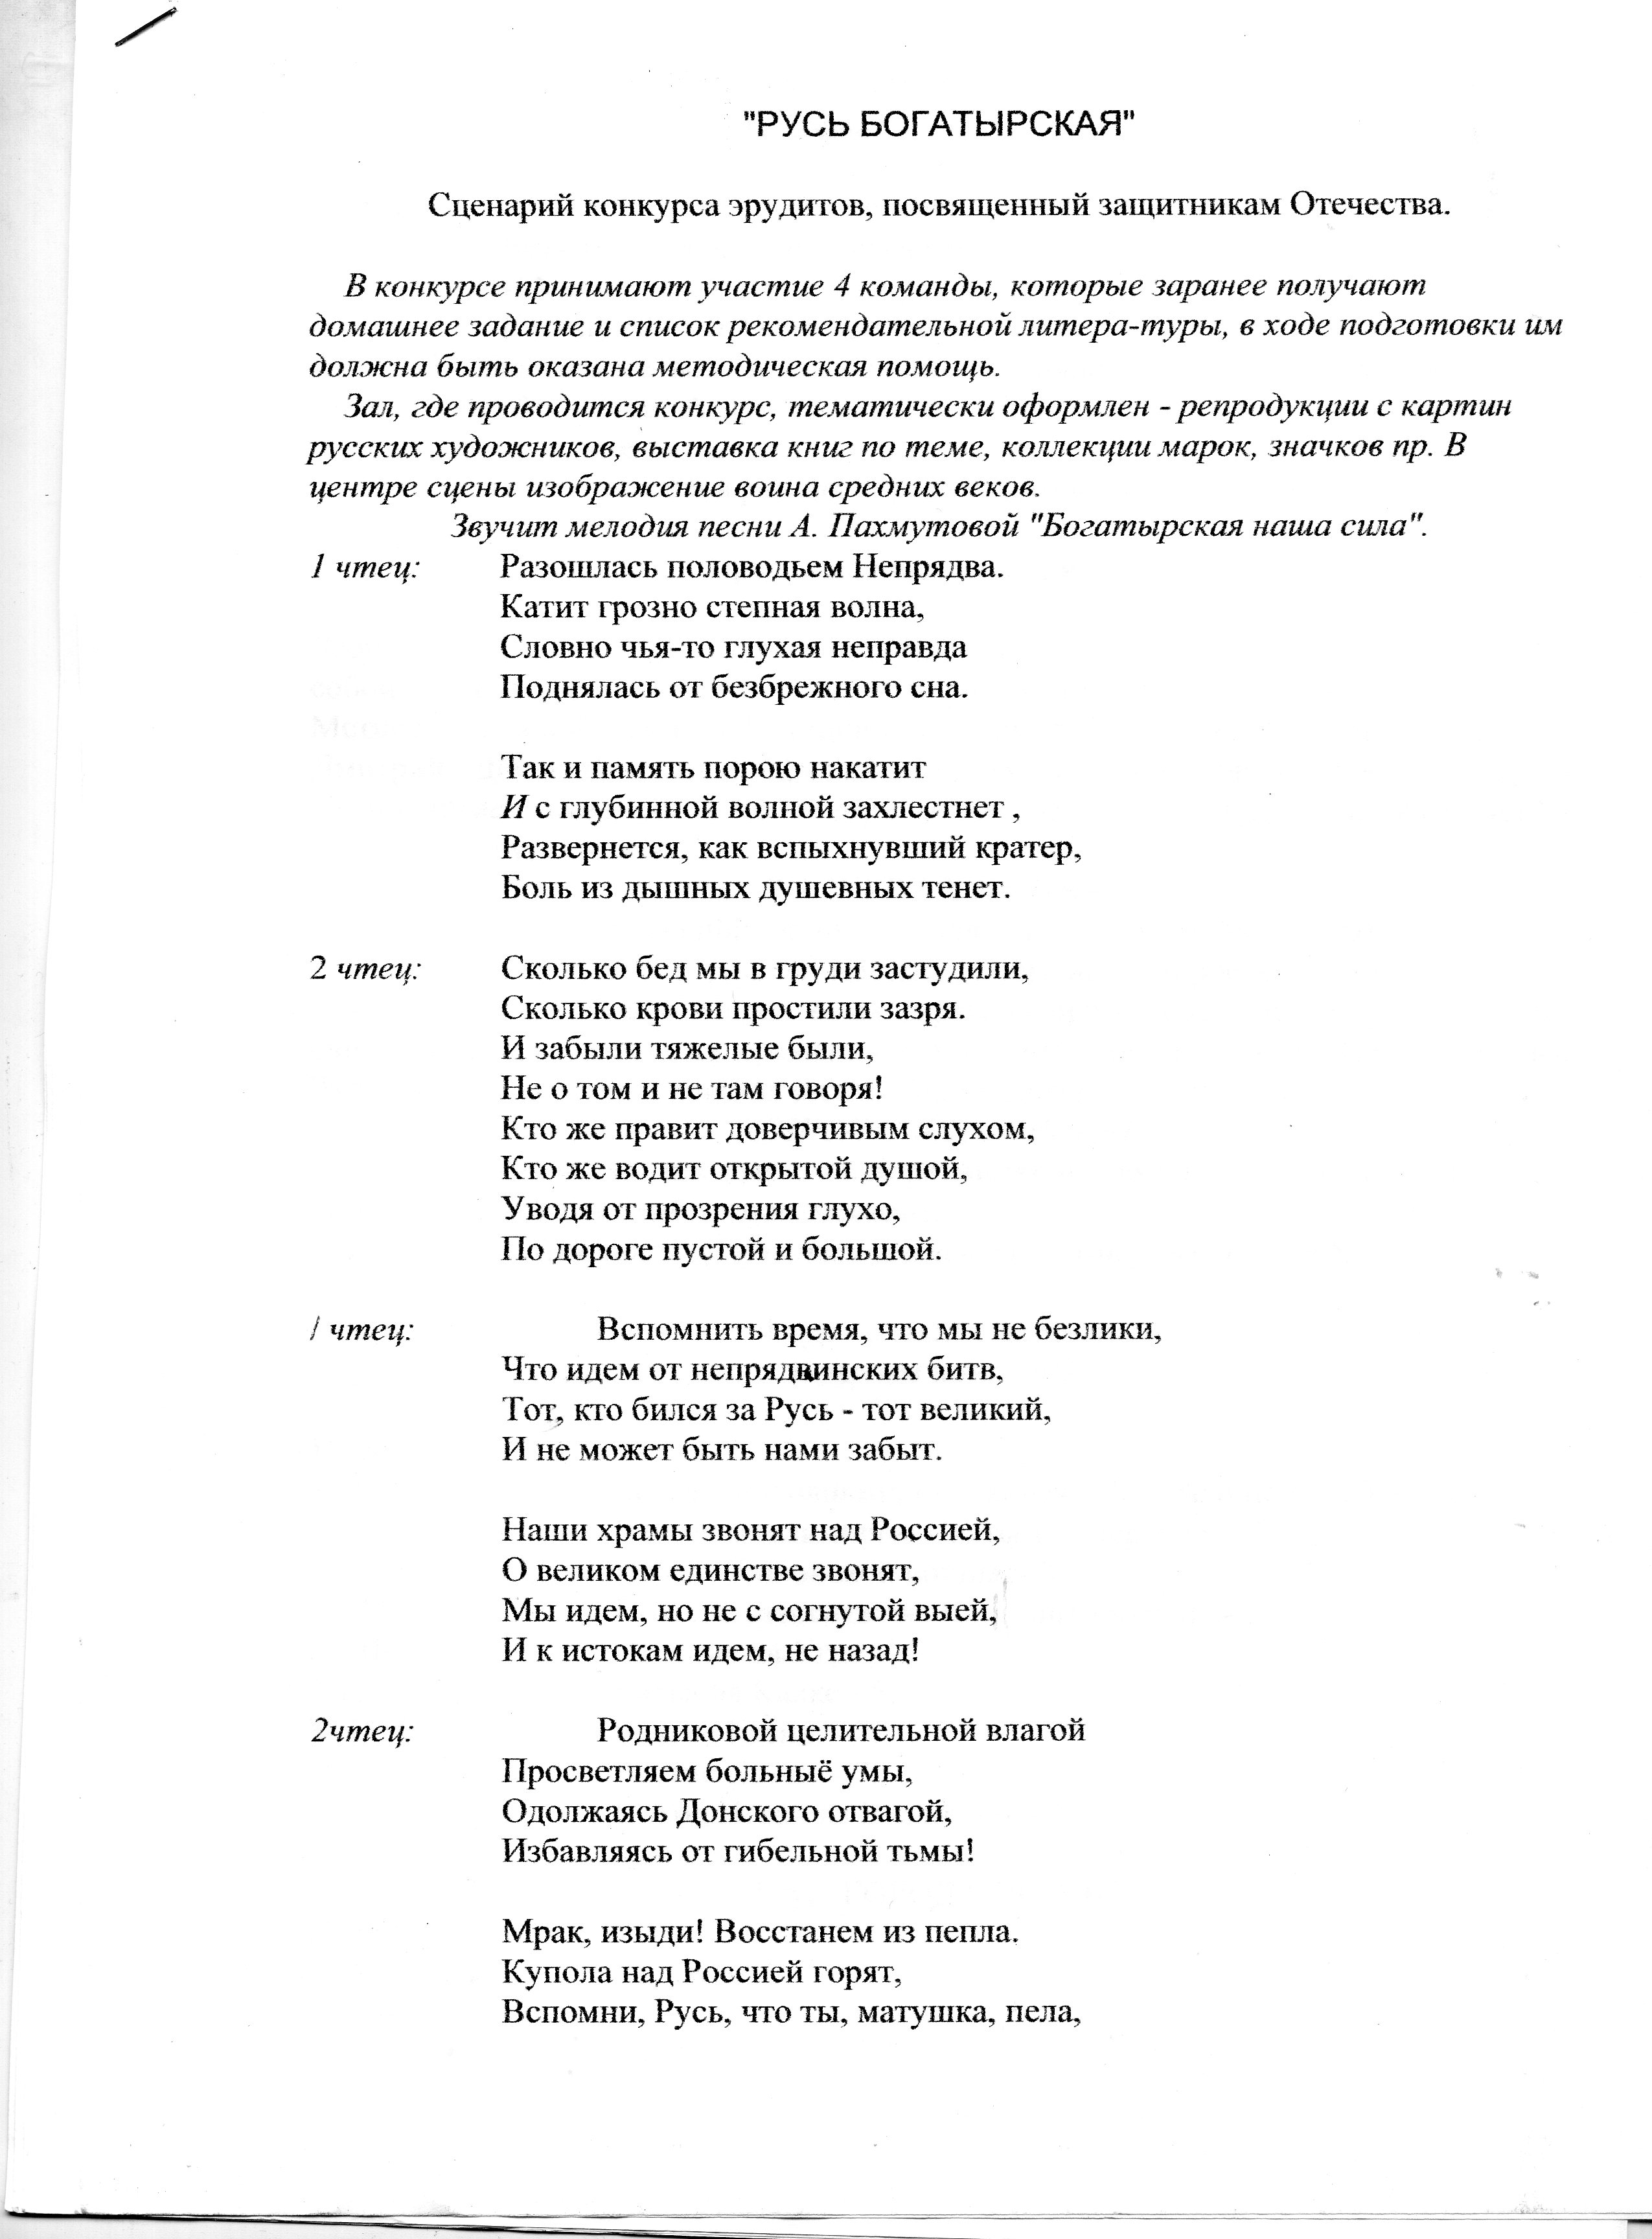 C:\Users\Ульяна\Pictures\скан475.jpg